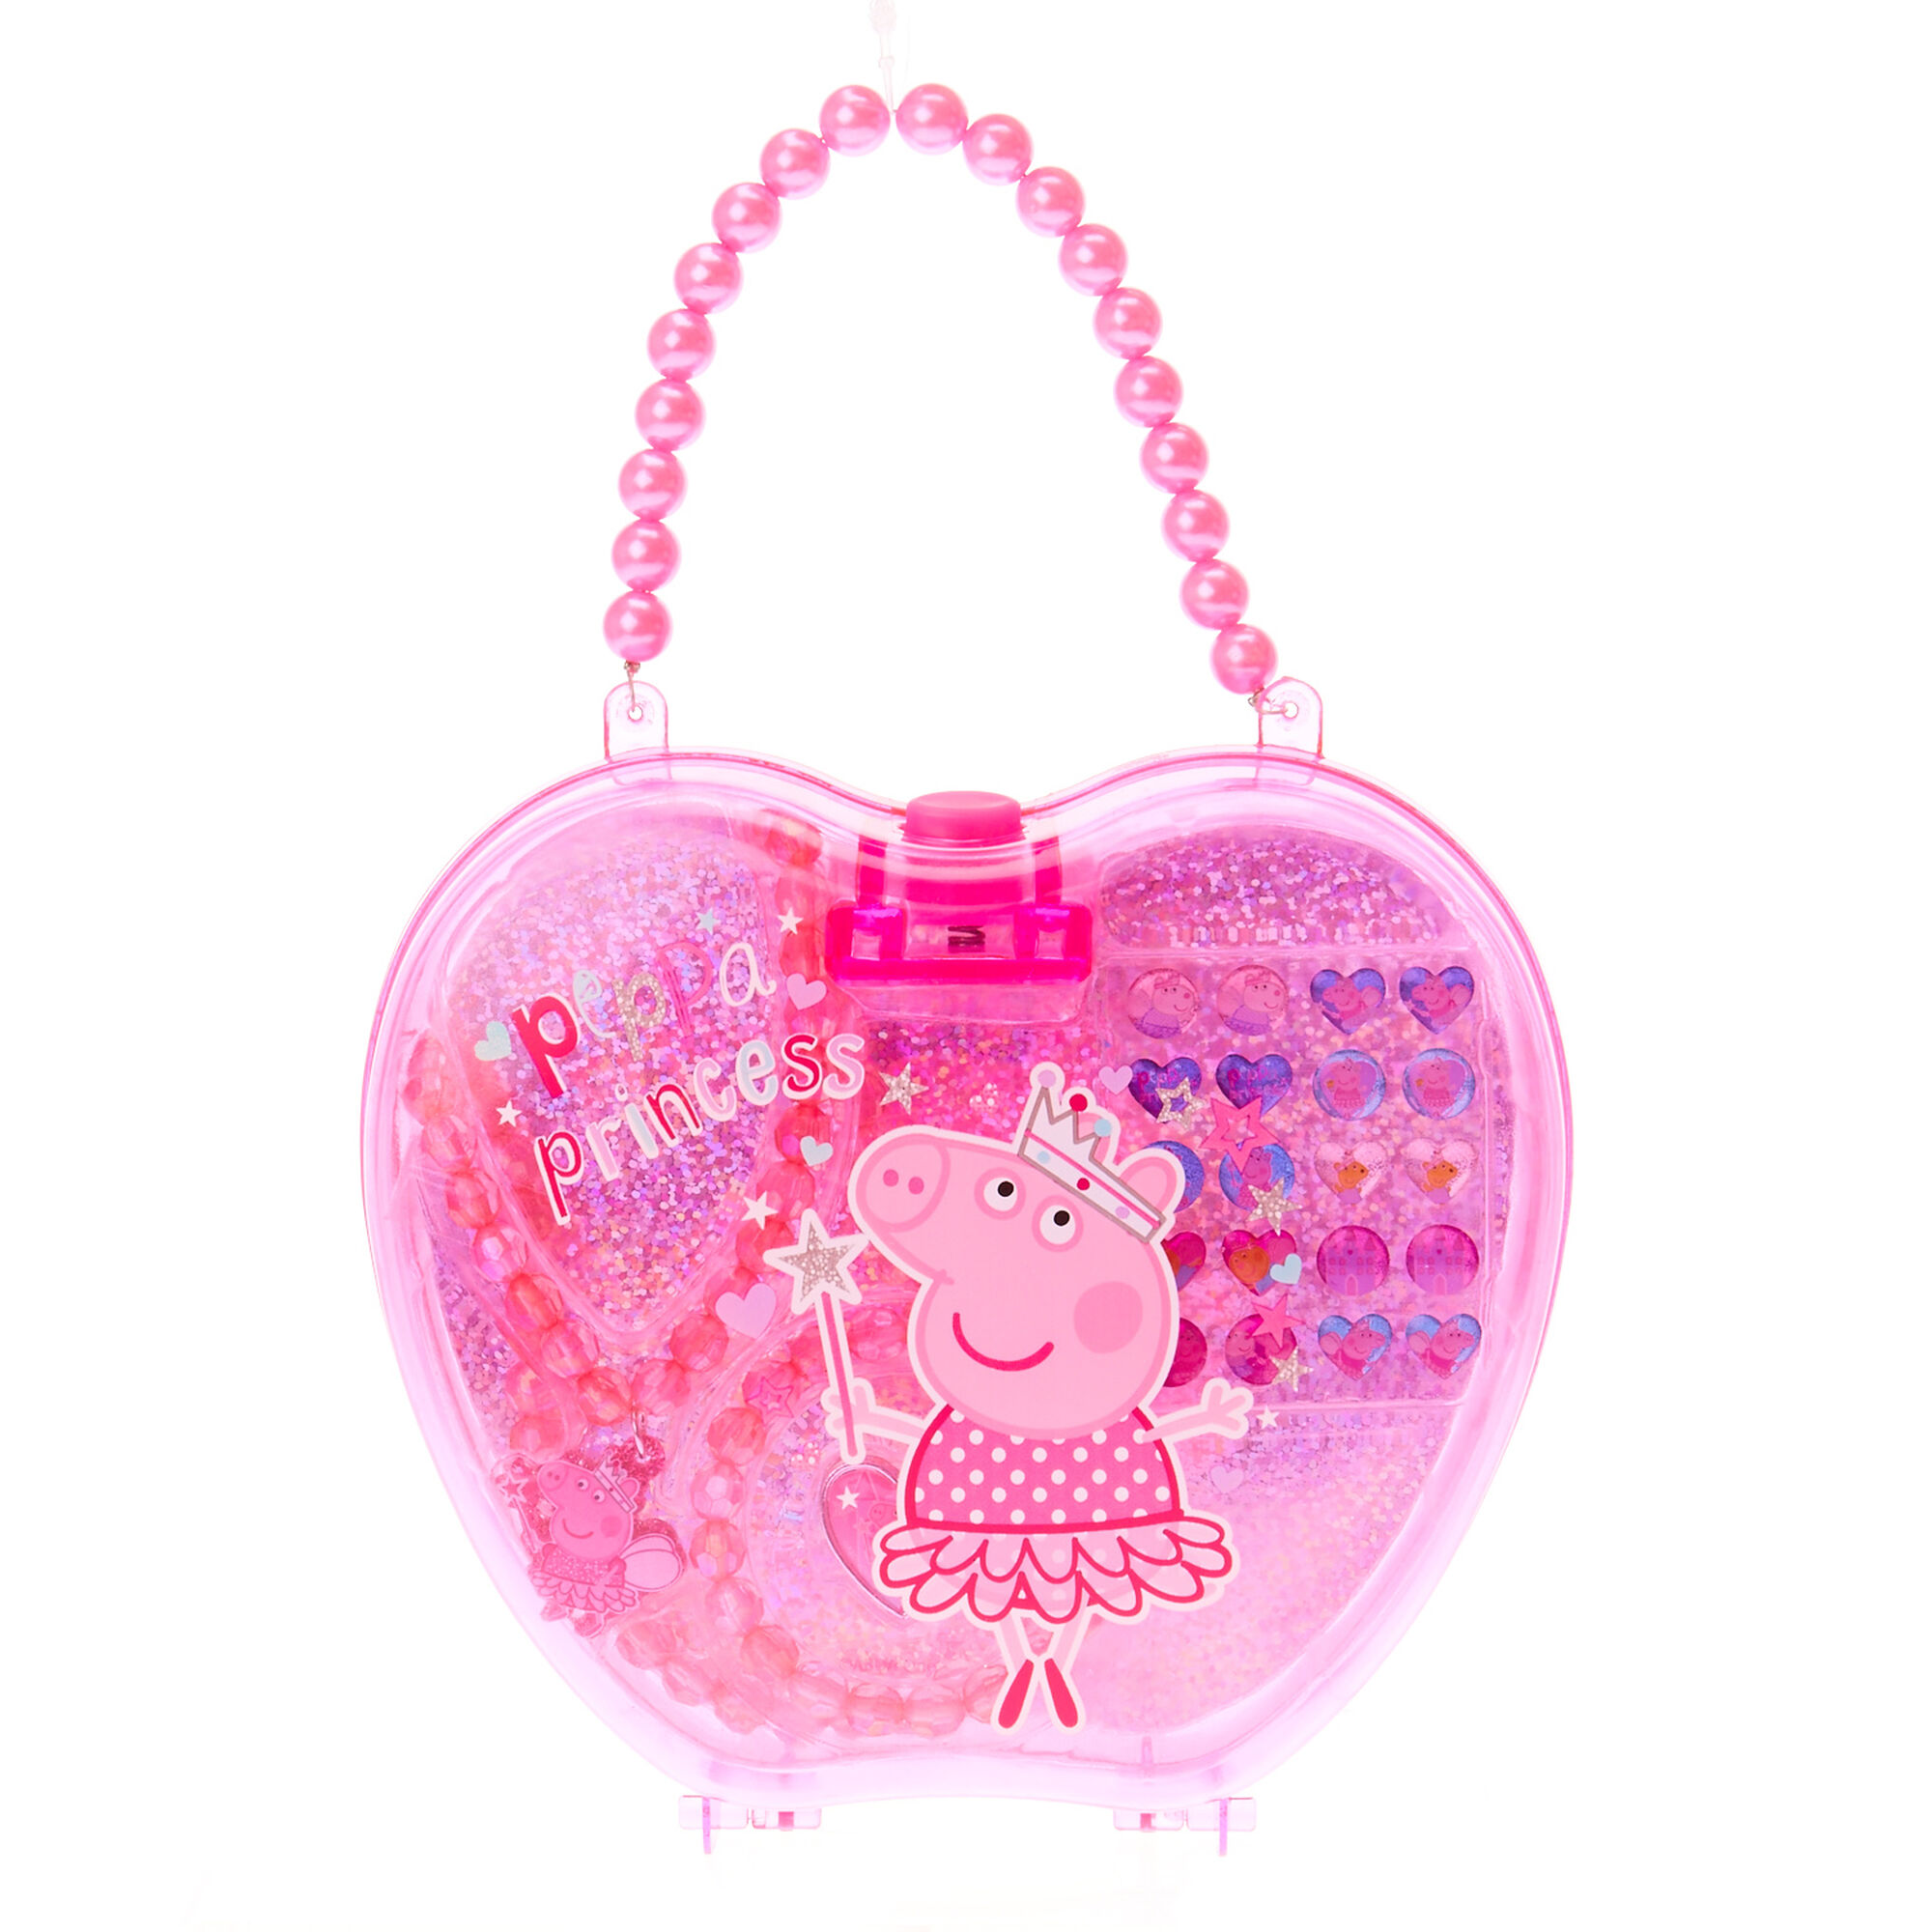 Peppa Pig Jewellery Handbag Set